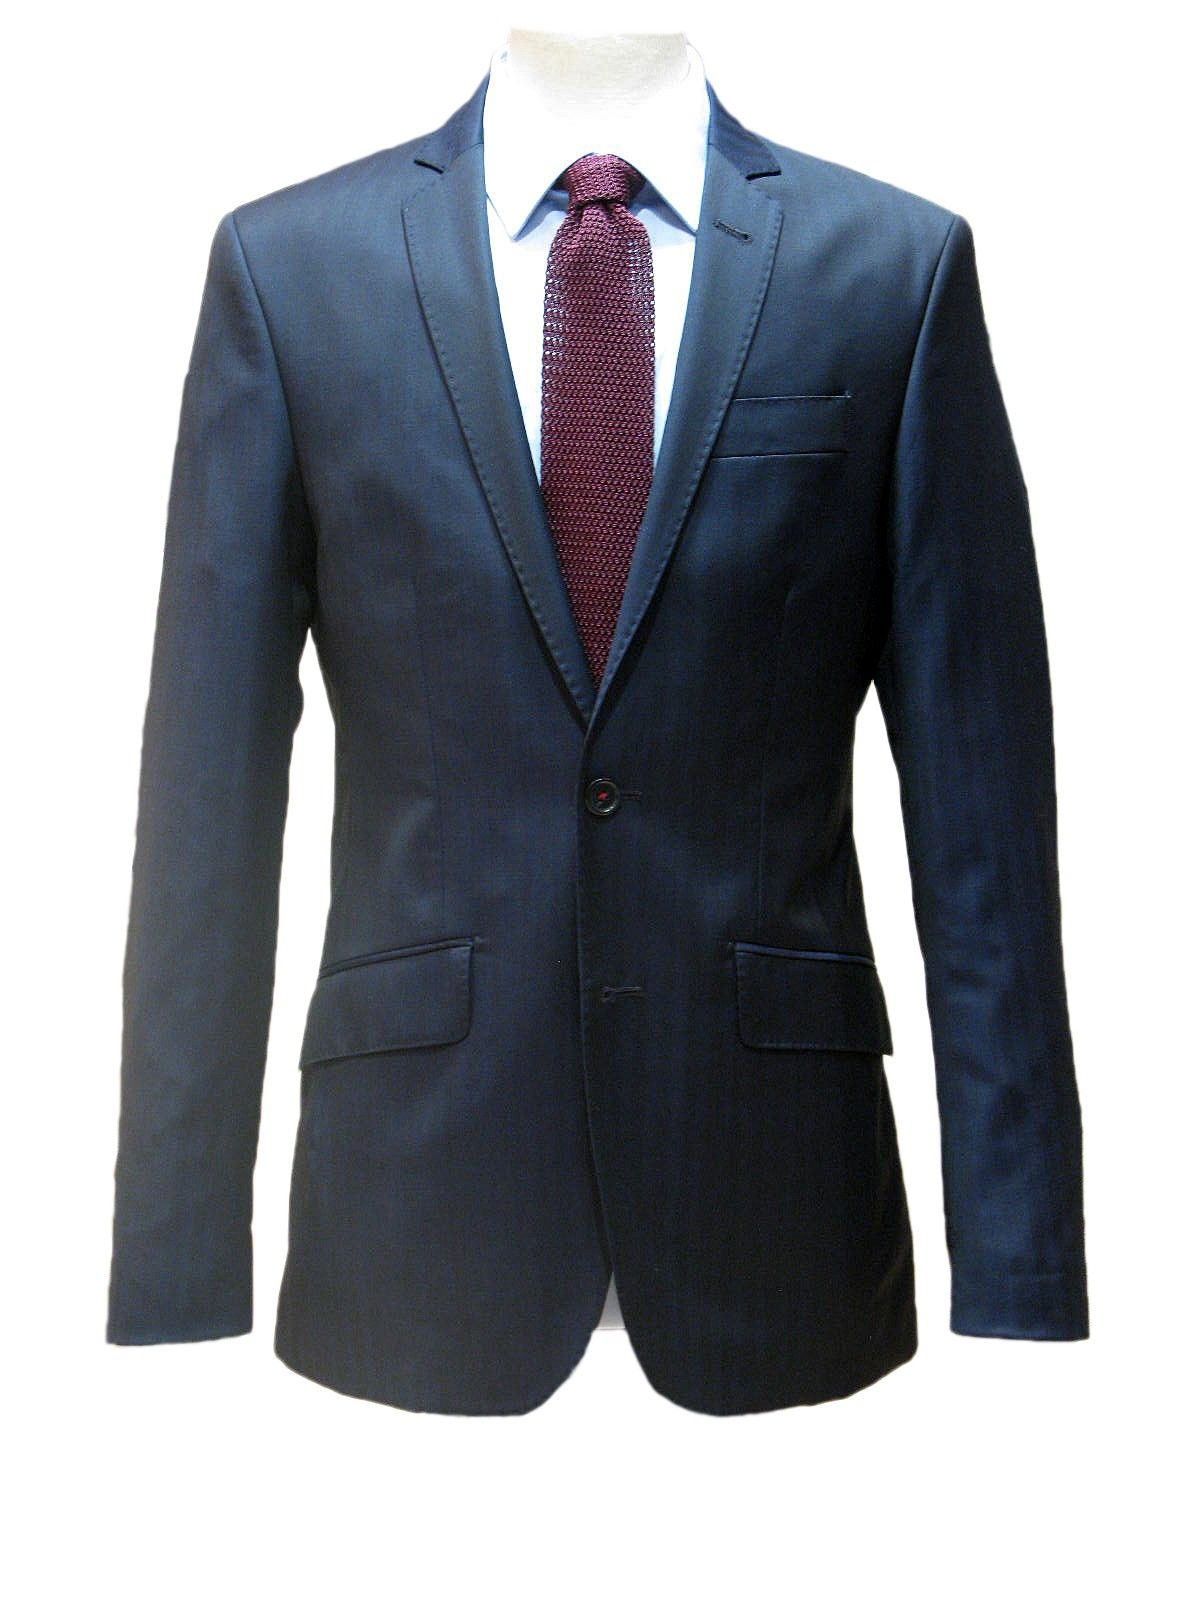 costume bleu marine en pure laine super 150 39 s alessandro paris. Black Bedroom Furniture Sets. Home Design Ideas